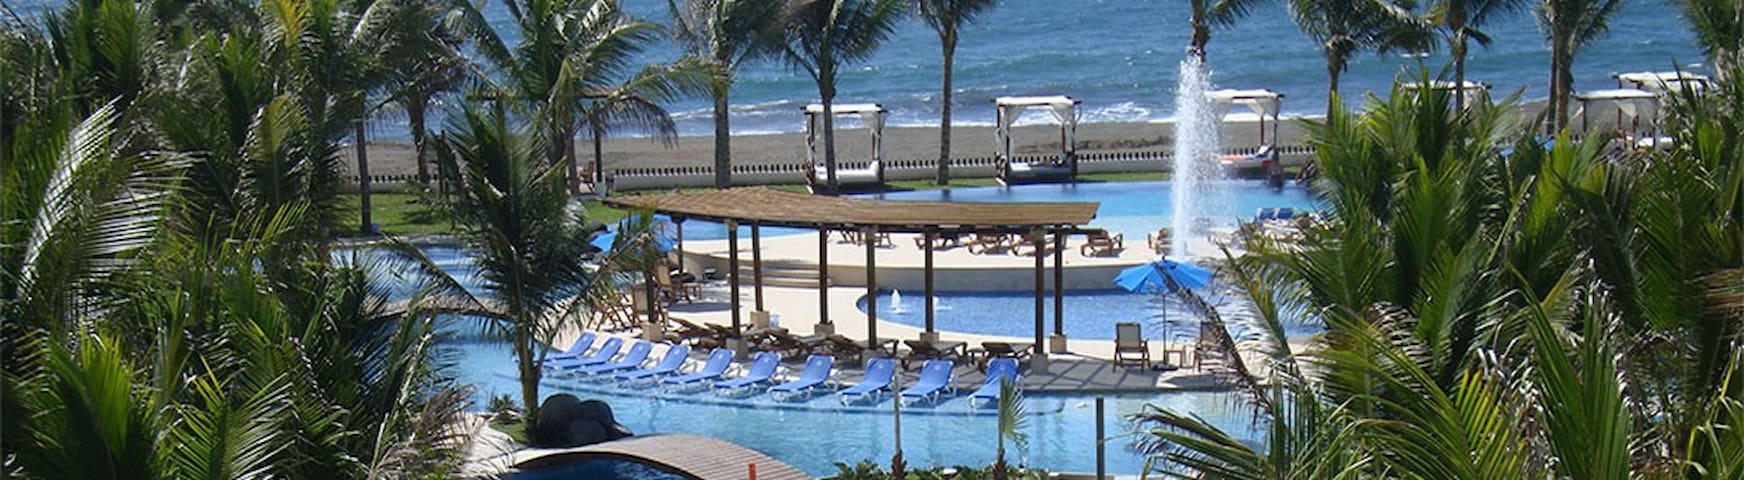 Lindo apto en condominio, piscinas, frente al mar - Monterrico - Pis